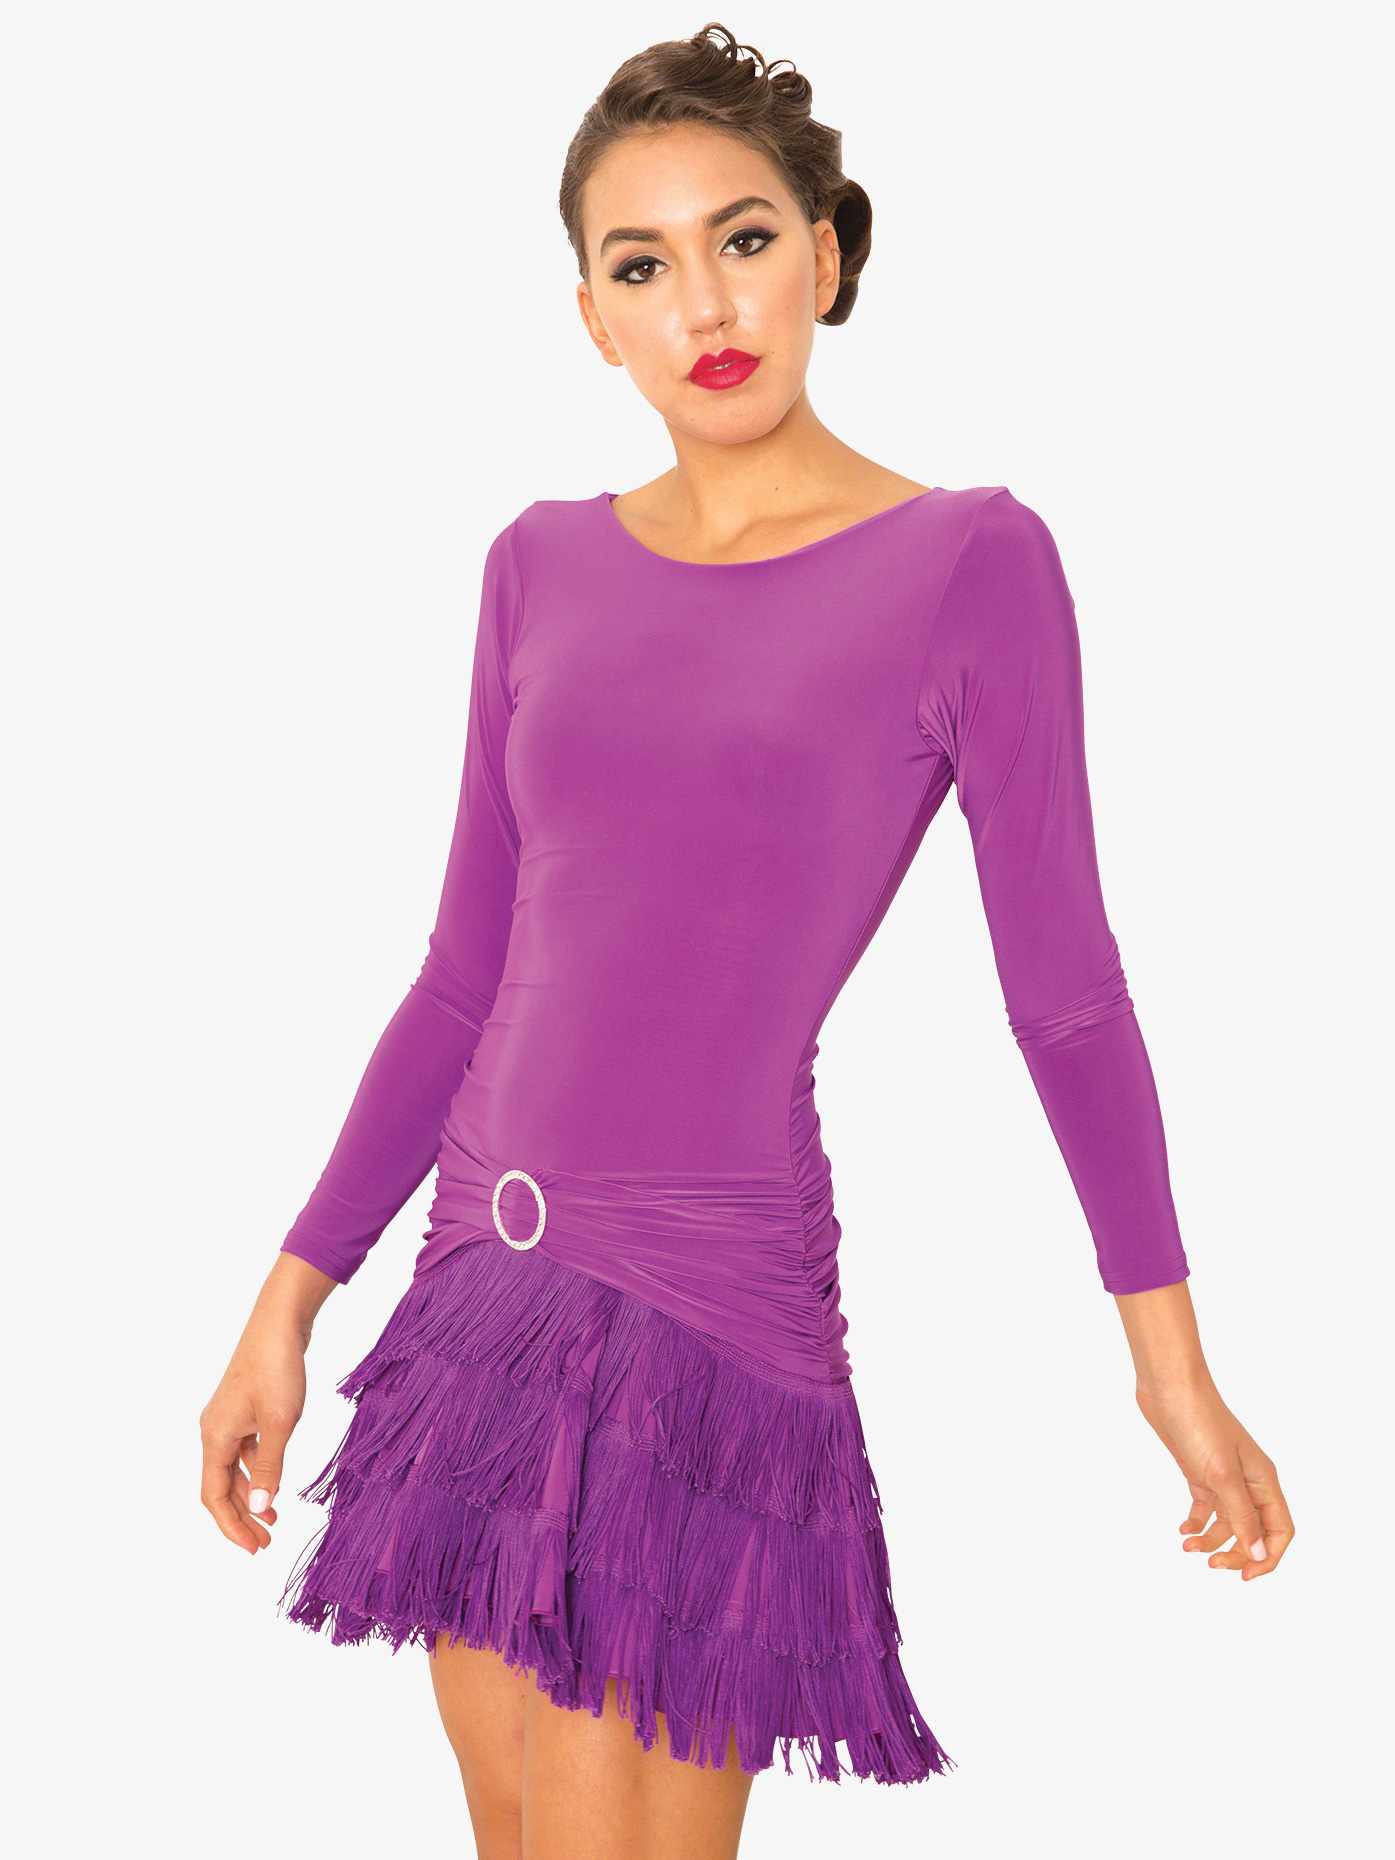 d5b51f4f28ed8 Womens Fringe Long Sleeve Ballroom Dance Dress - Style No D812. Loading zoom